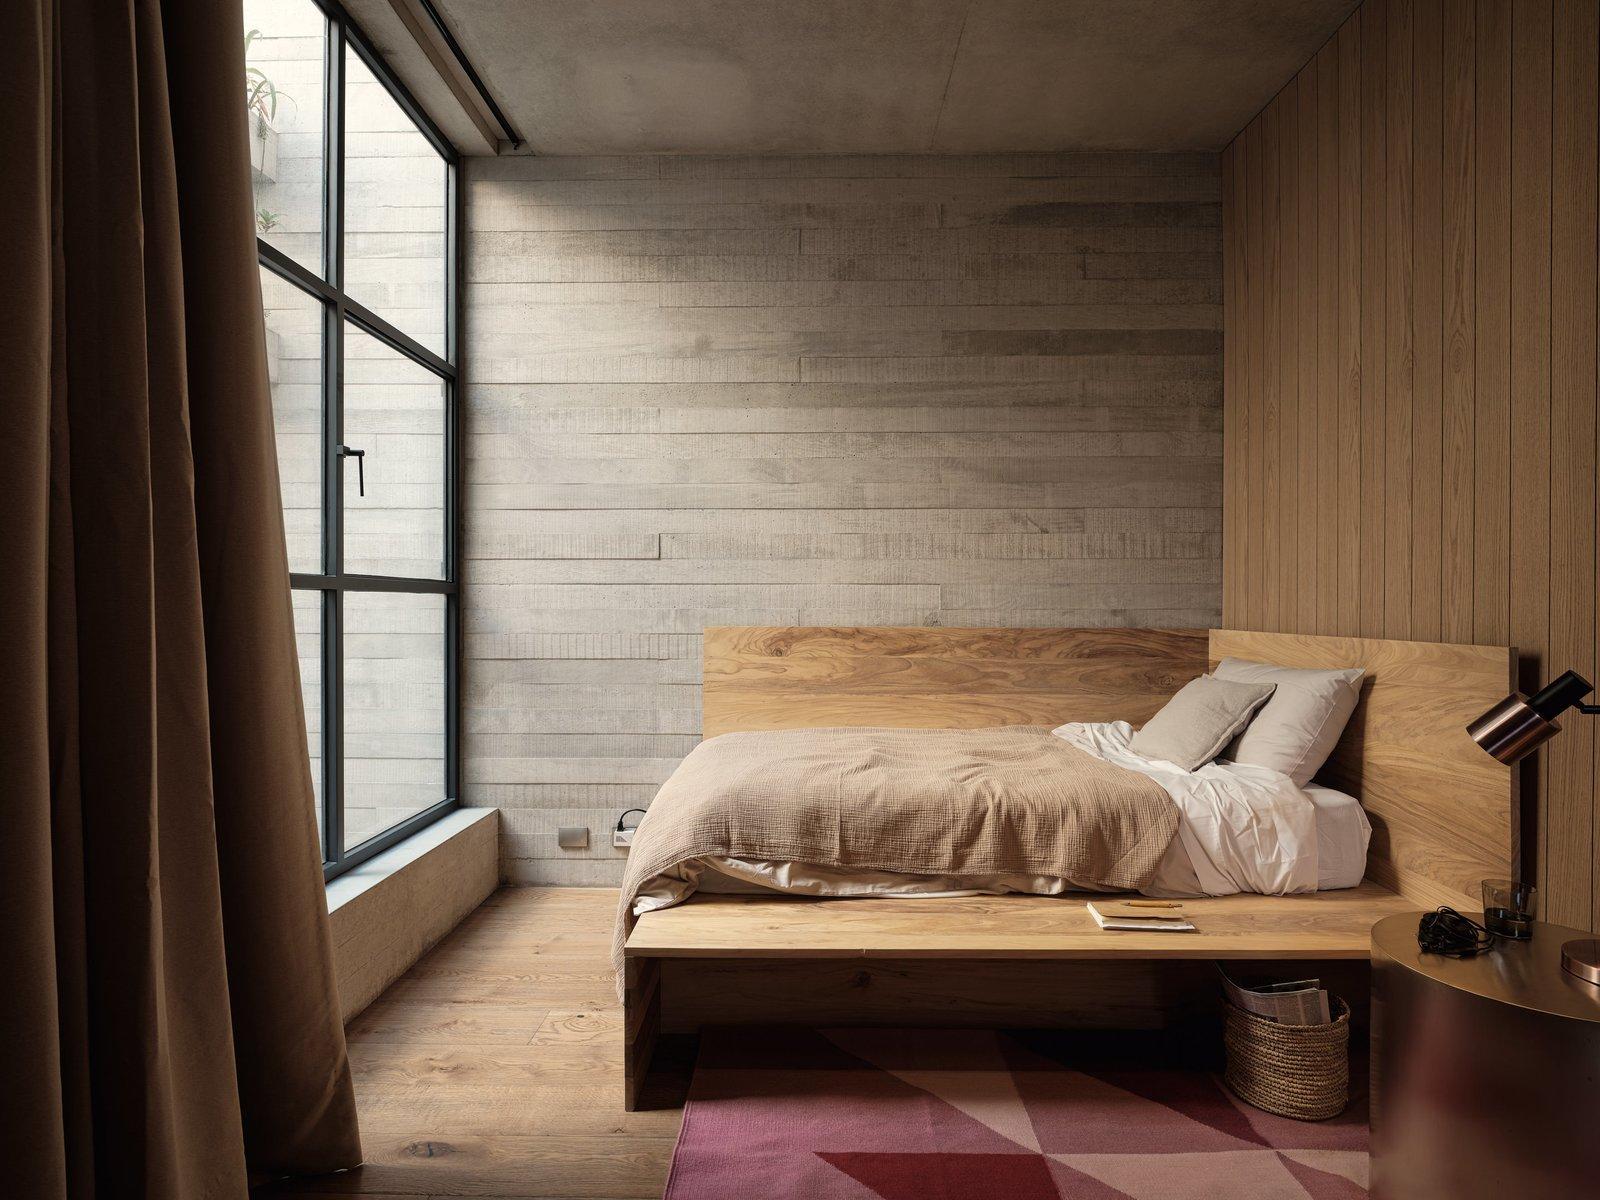 Tennyson 205 Rick Joy Polanco Apartment Bedroom